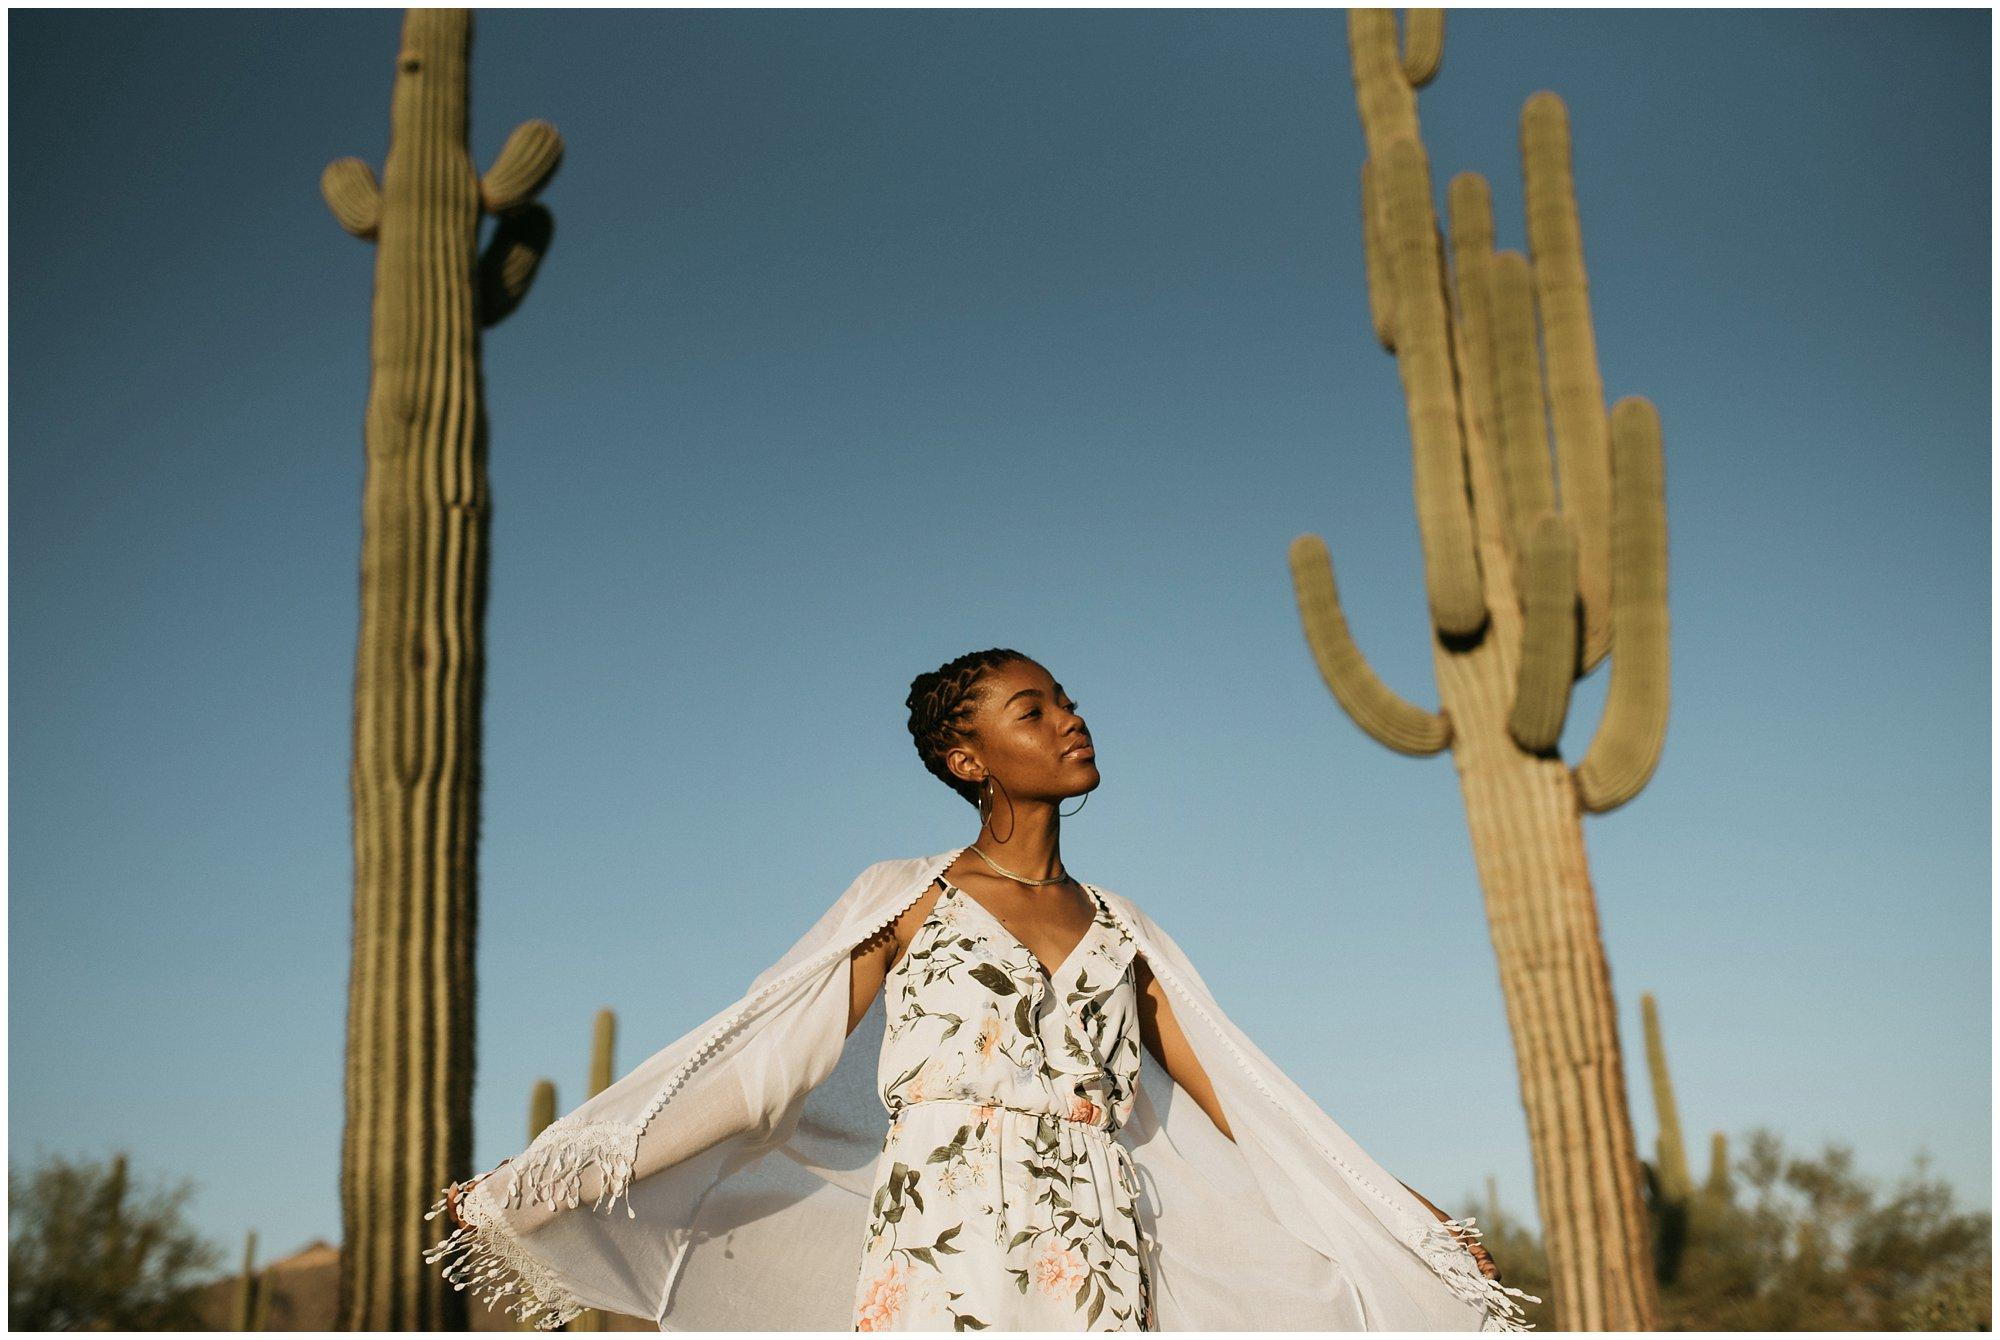 Desert Model Portrait Session - Ashtyn Nicole Photo_0017.jpg